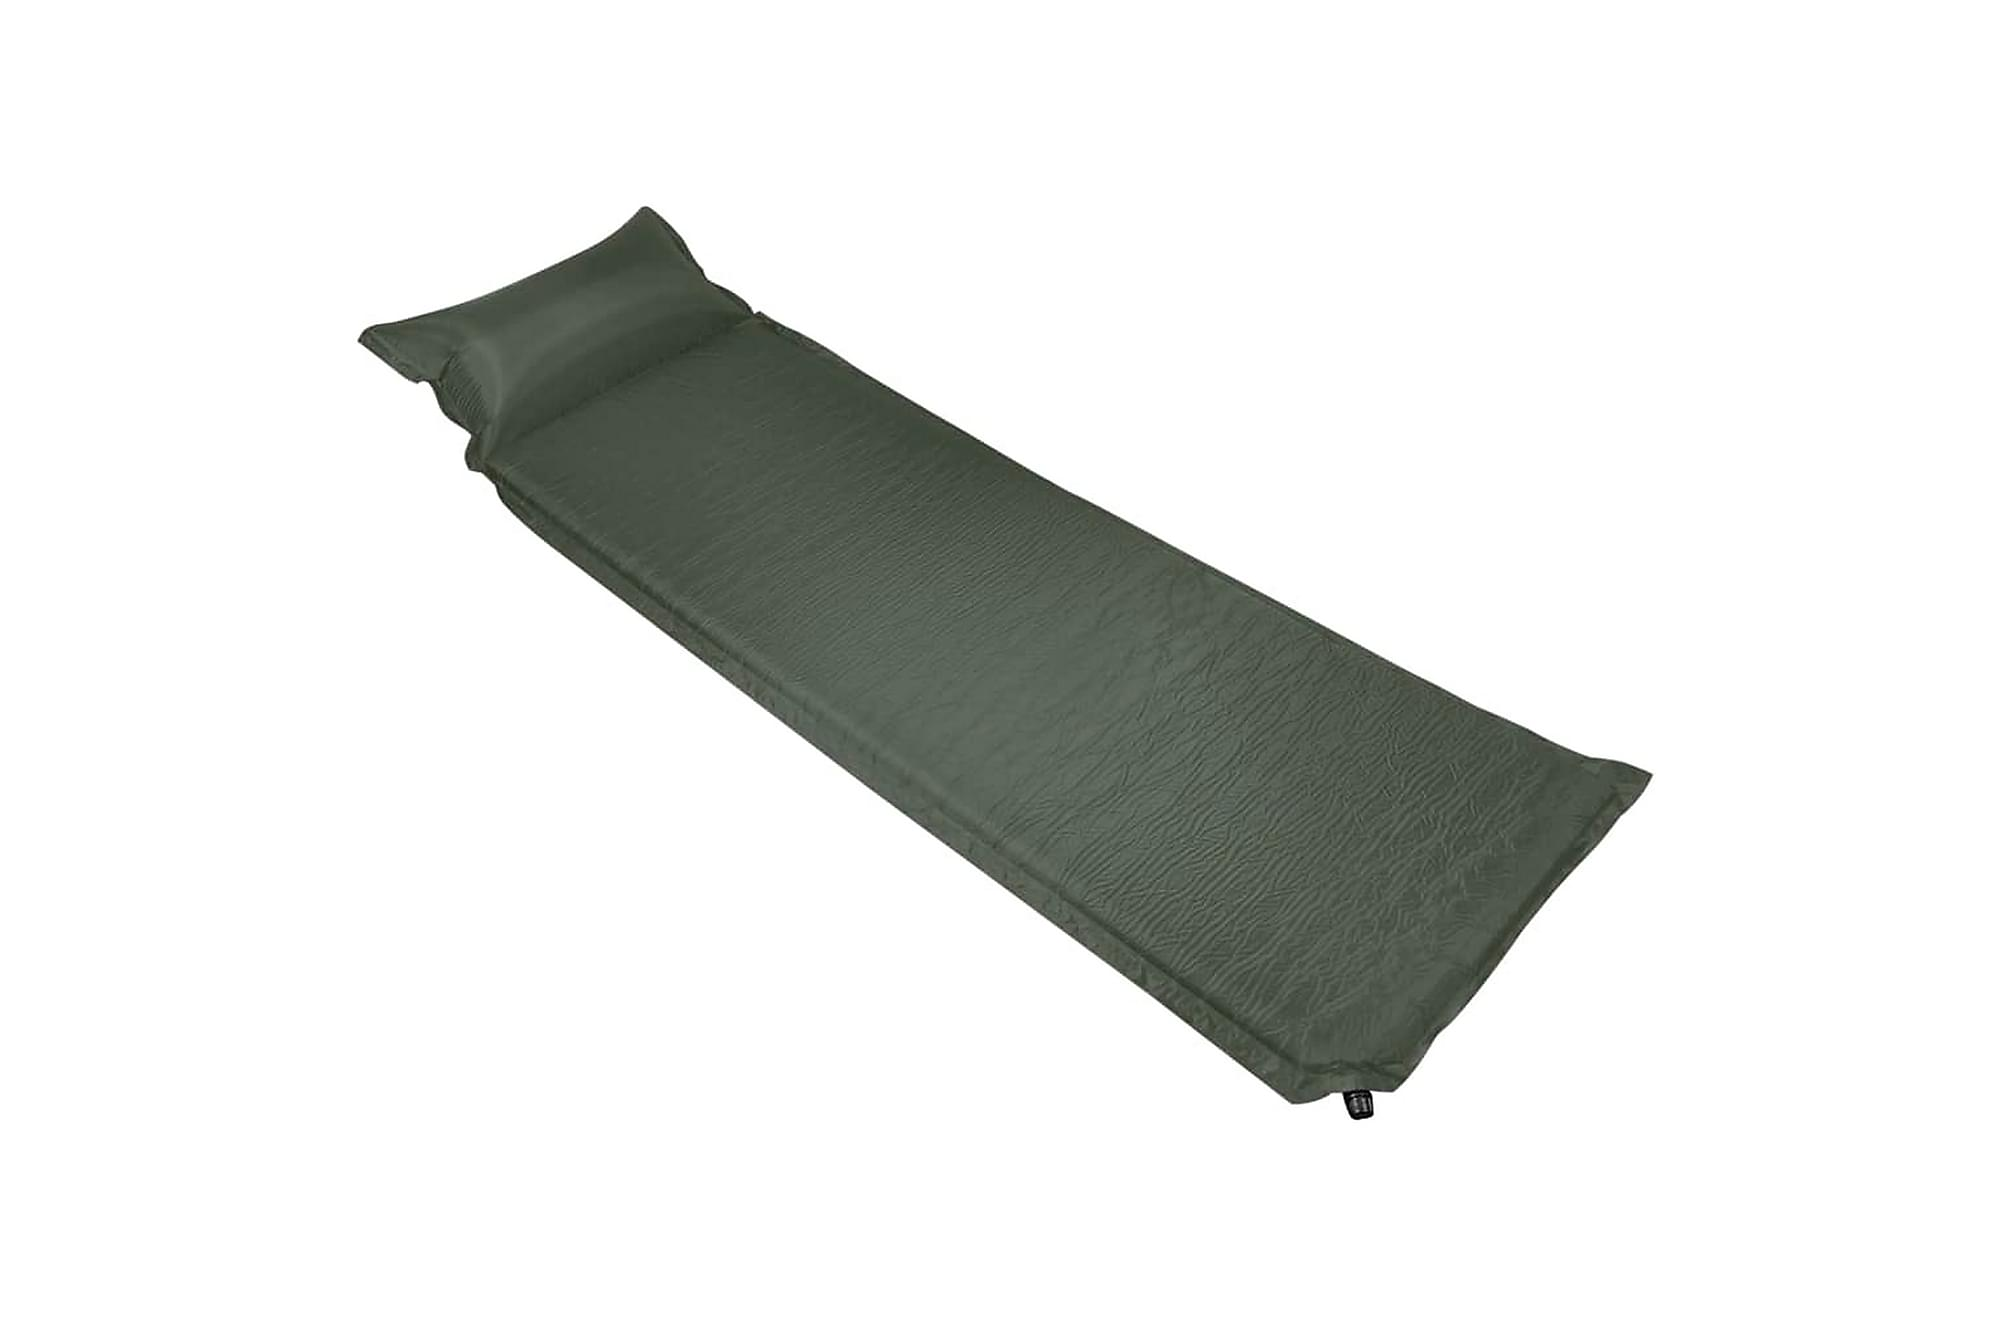 Luftmadrass med kudde 66x200 cm mörkgrön, Luftmadrasser & uppblåsbara madrass